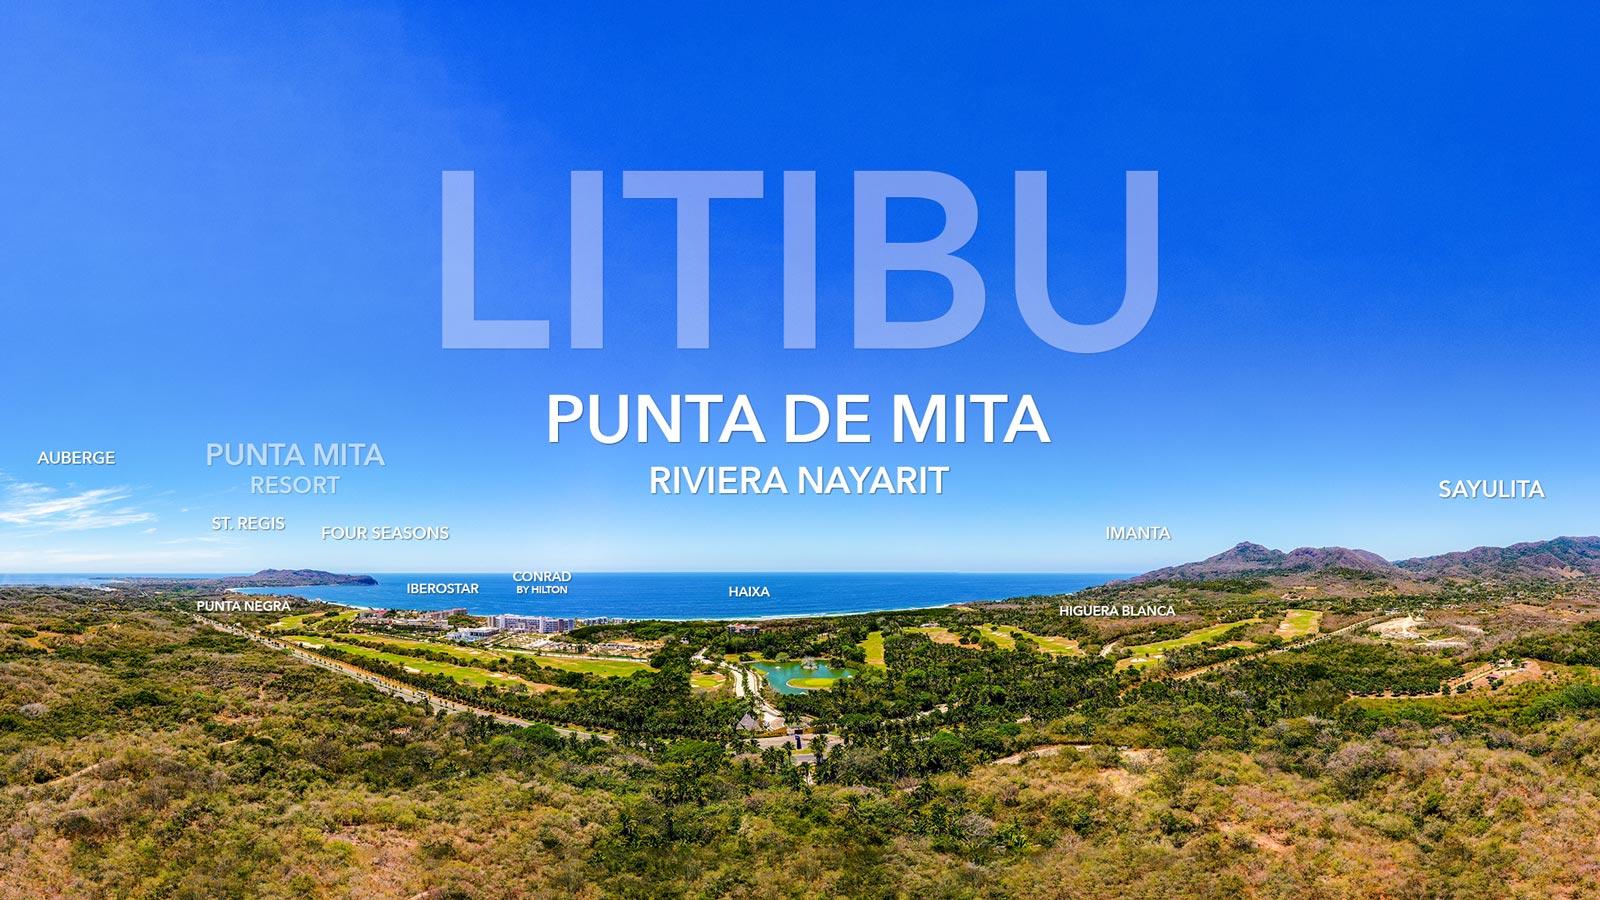 Litibu - FONATUR development in Punta de Mita, Riviera Nayarit featuring the Hilton Conrad, Iberostar, Haixa nd the residential neighborhoods of Punta Negra and Higuera Blanca as well as the divine luxury resort called Imanta.